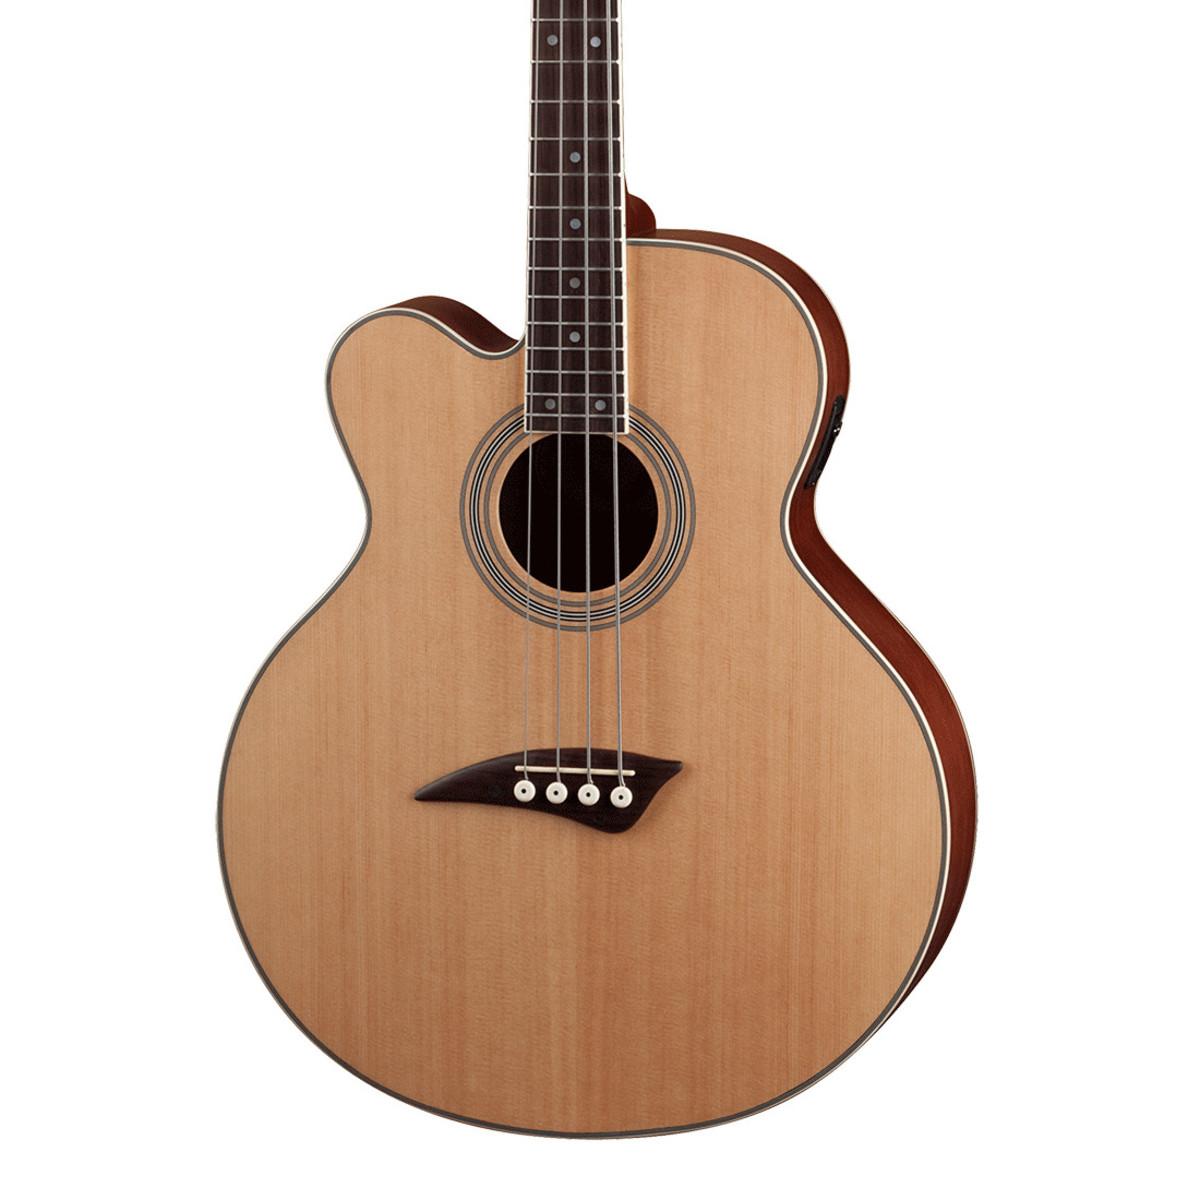 dean caw left handed electro acoustic bass guitar satin natural at. Black Bedroom Furniture Sets. Home Design Ideas